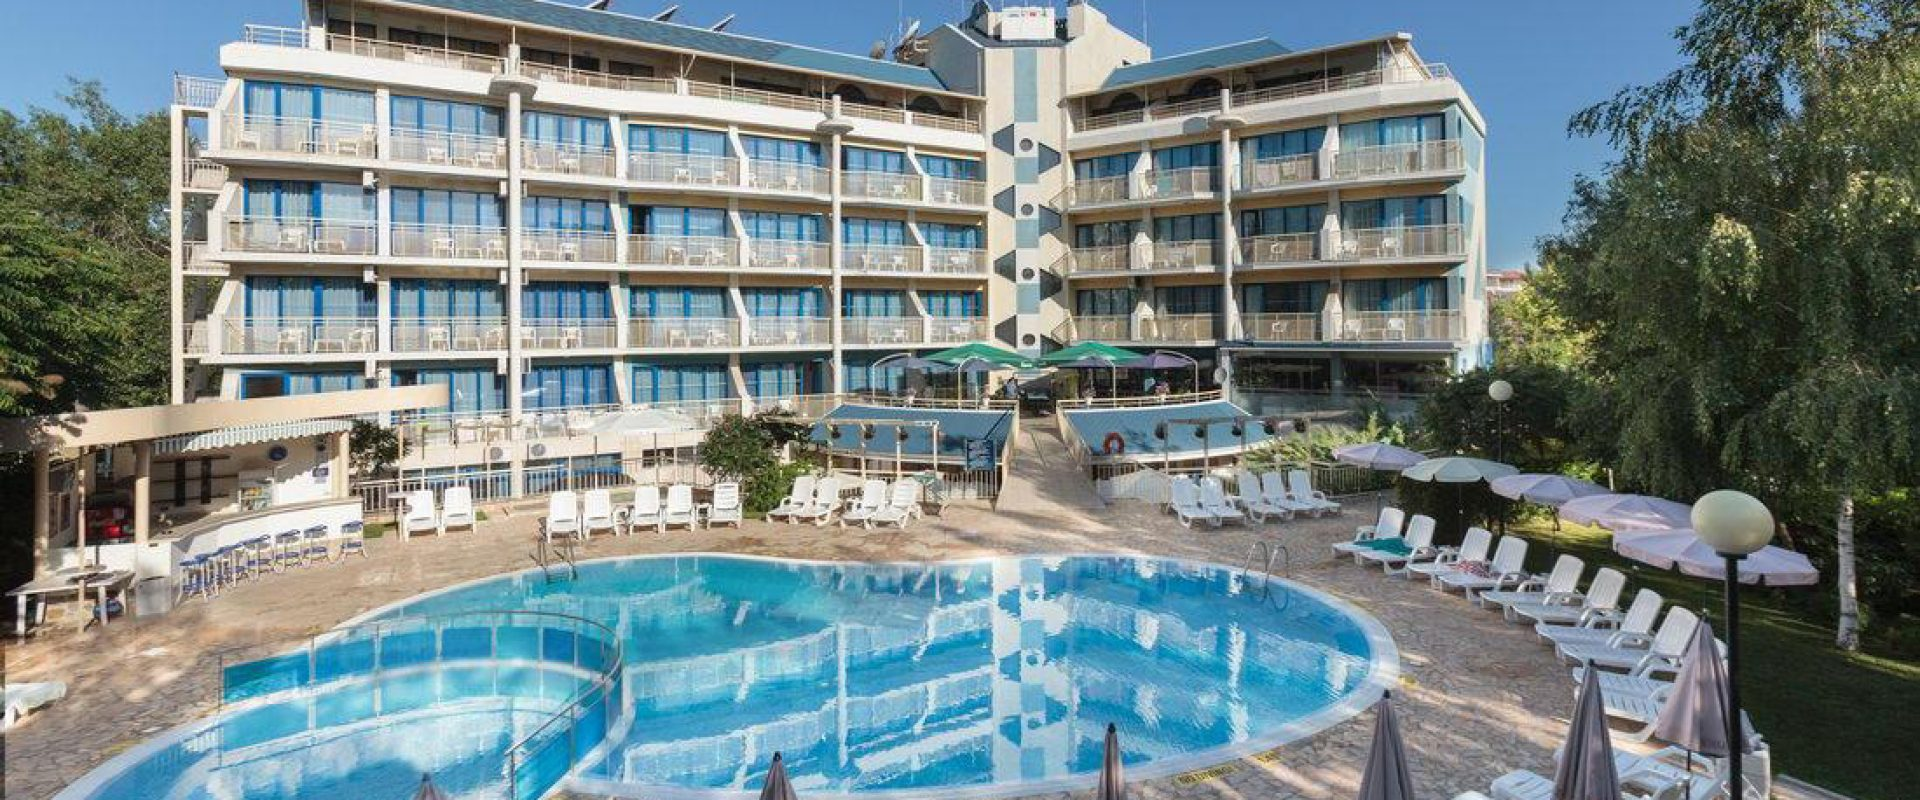 Ultra all inclusive în Bulgaria, Sunny Beach, Hotelul Aquamarine